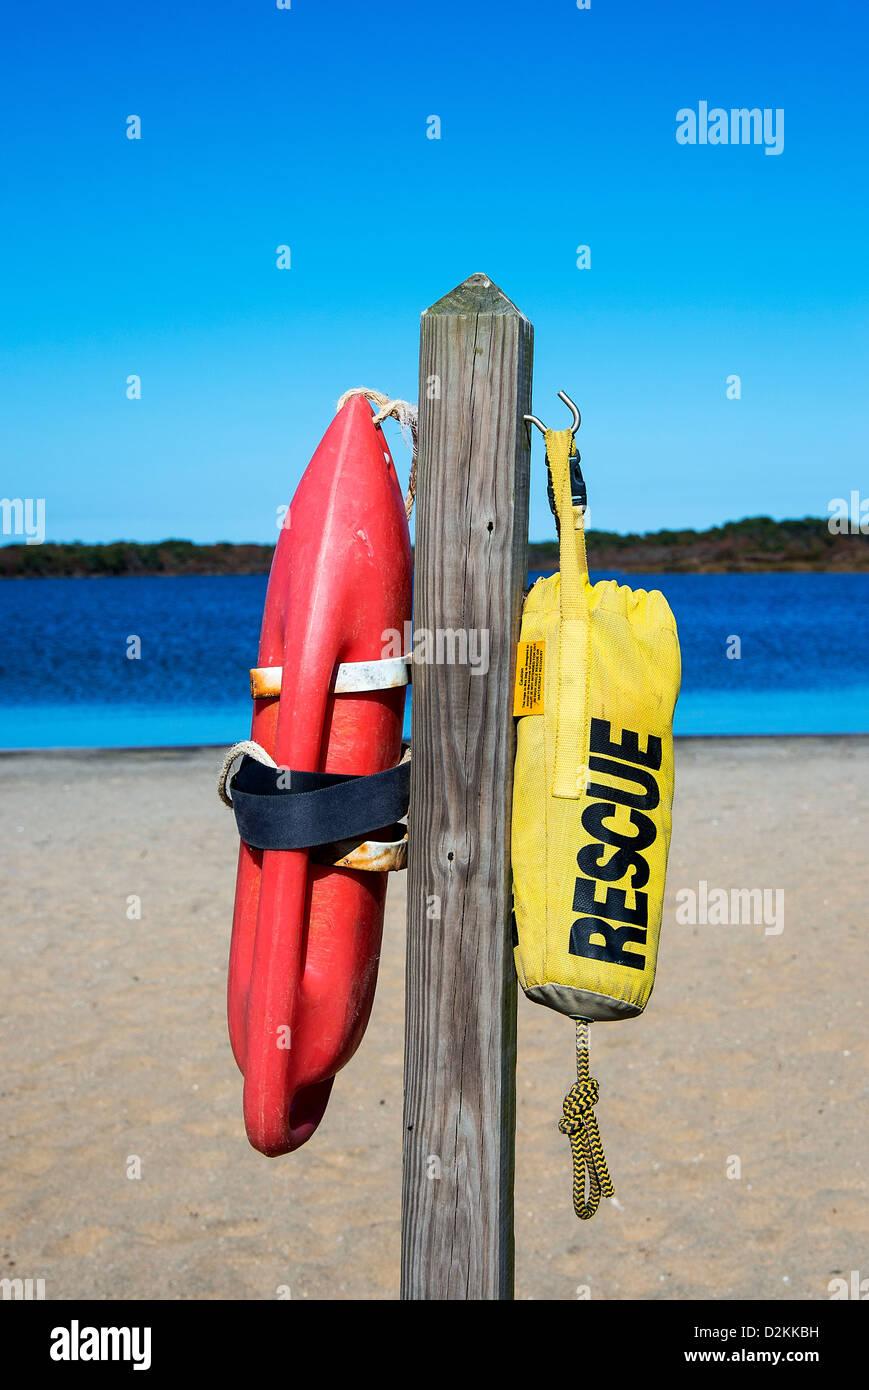 Rettung Schwimmer an einem Strand, Massachusetts, USA Stockbild